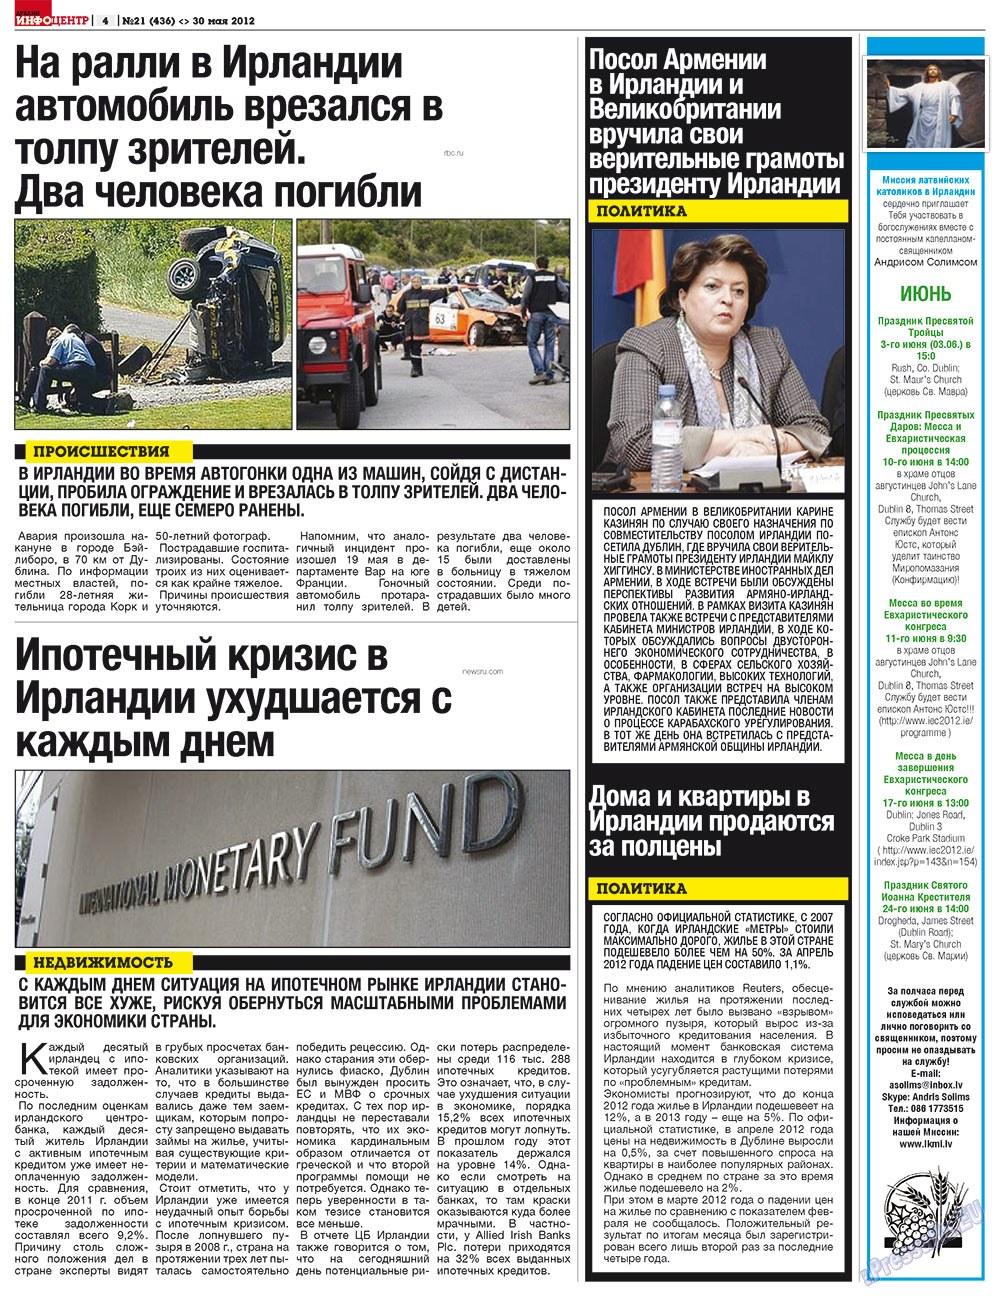 Дублин инфоцентр (газета). 2012 год, номер 21, стр. 4